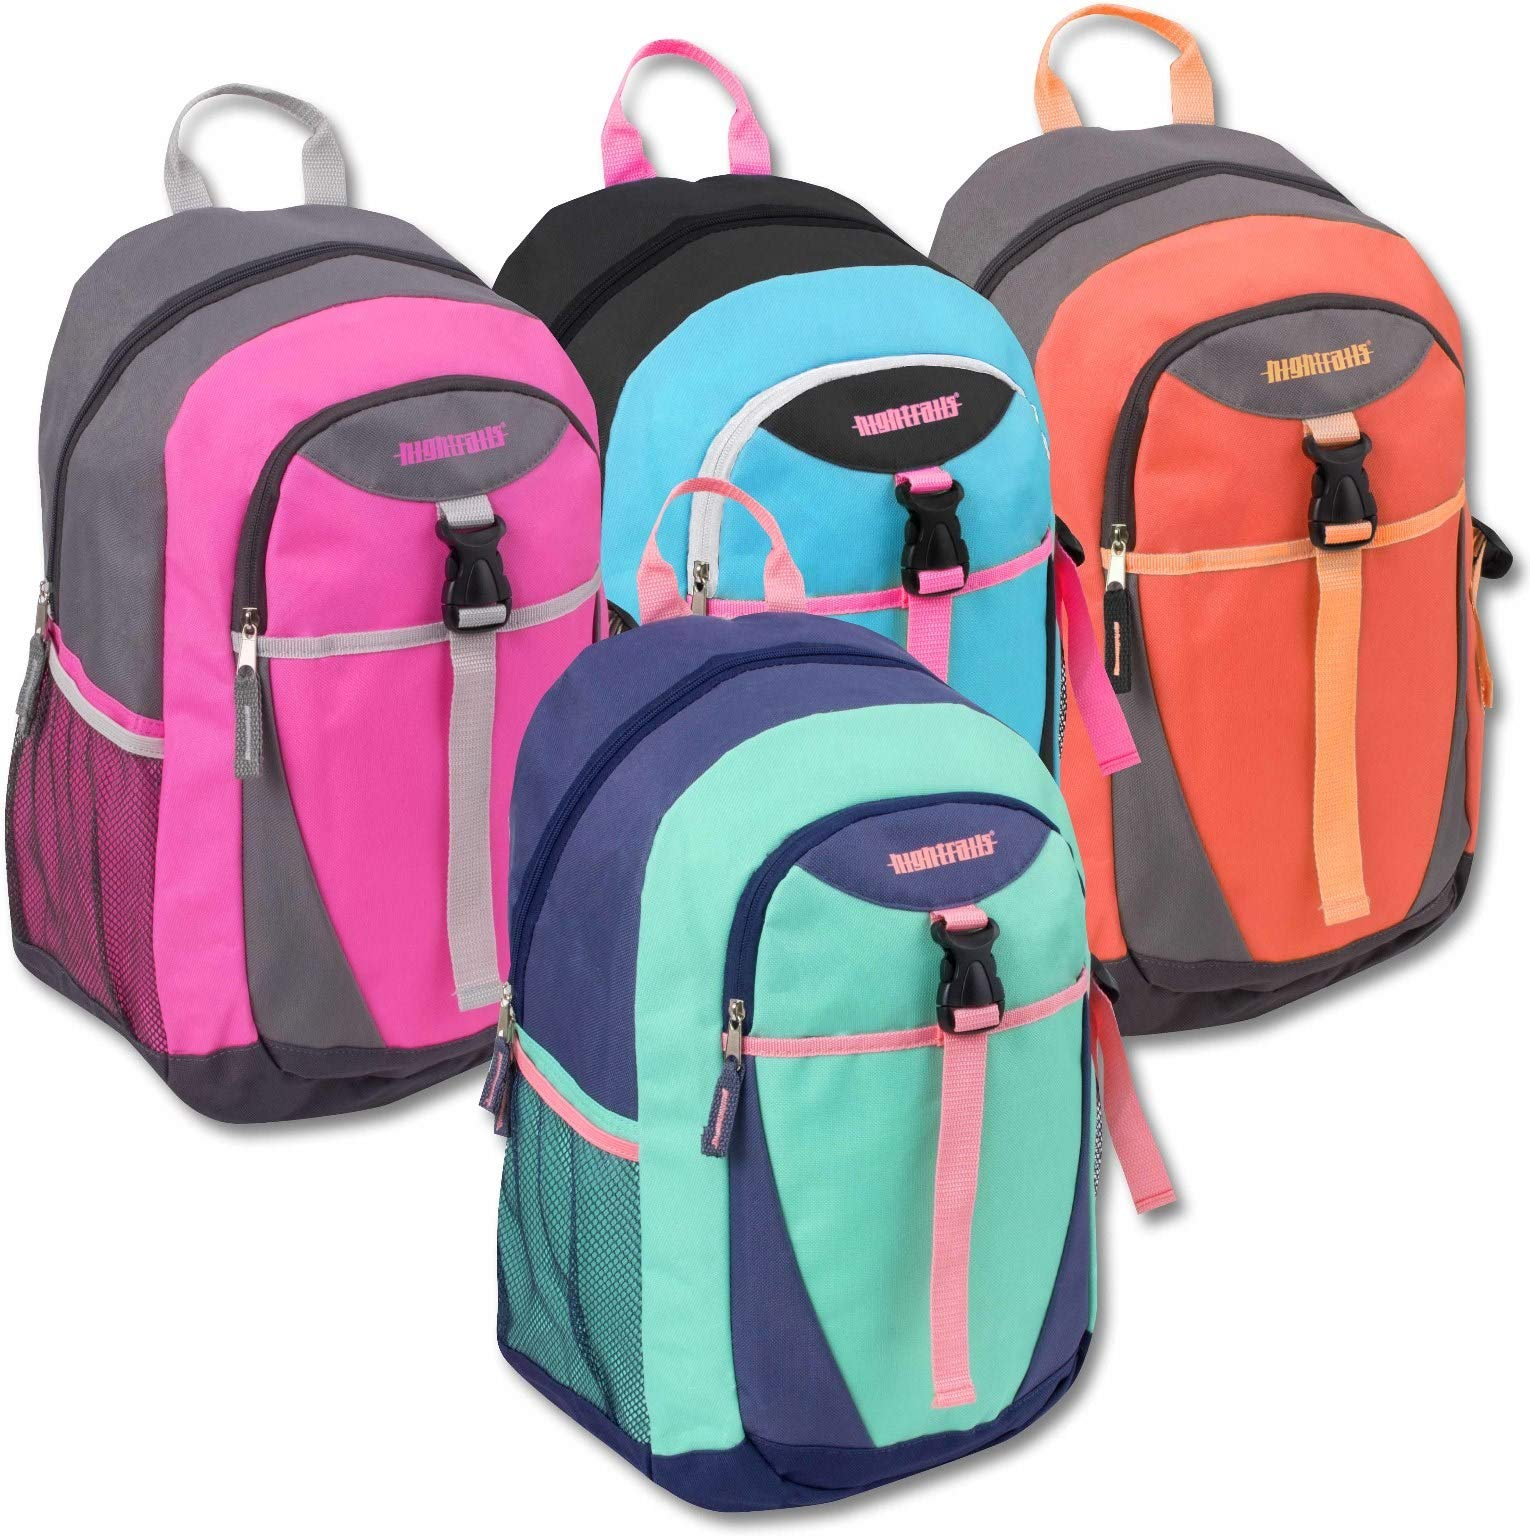 Urban Sport 18' Clip Pocket Backpack - Assorted Colors(pack Of 24)